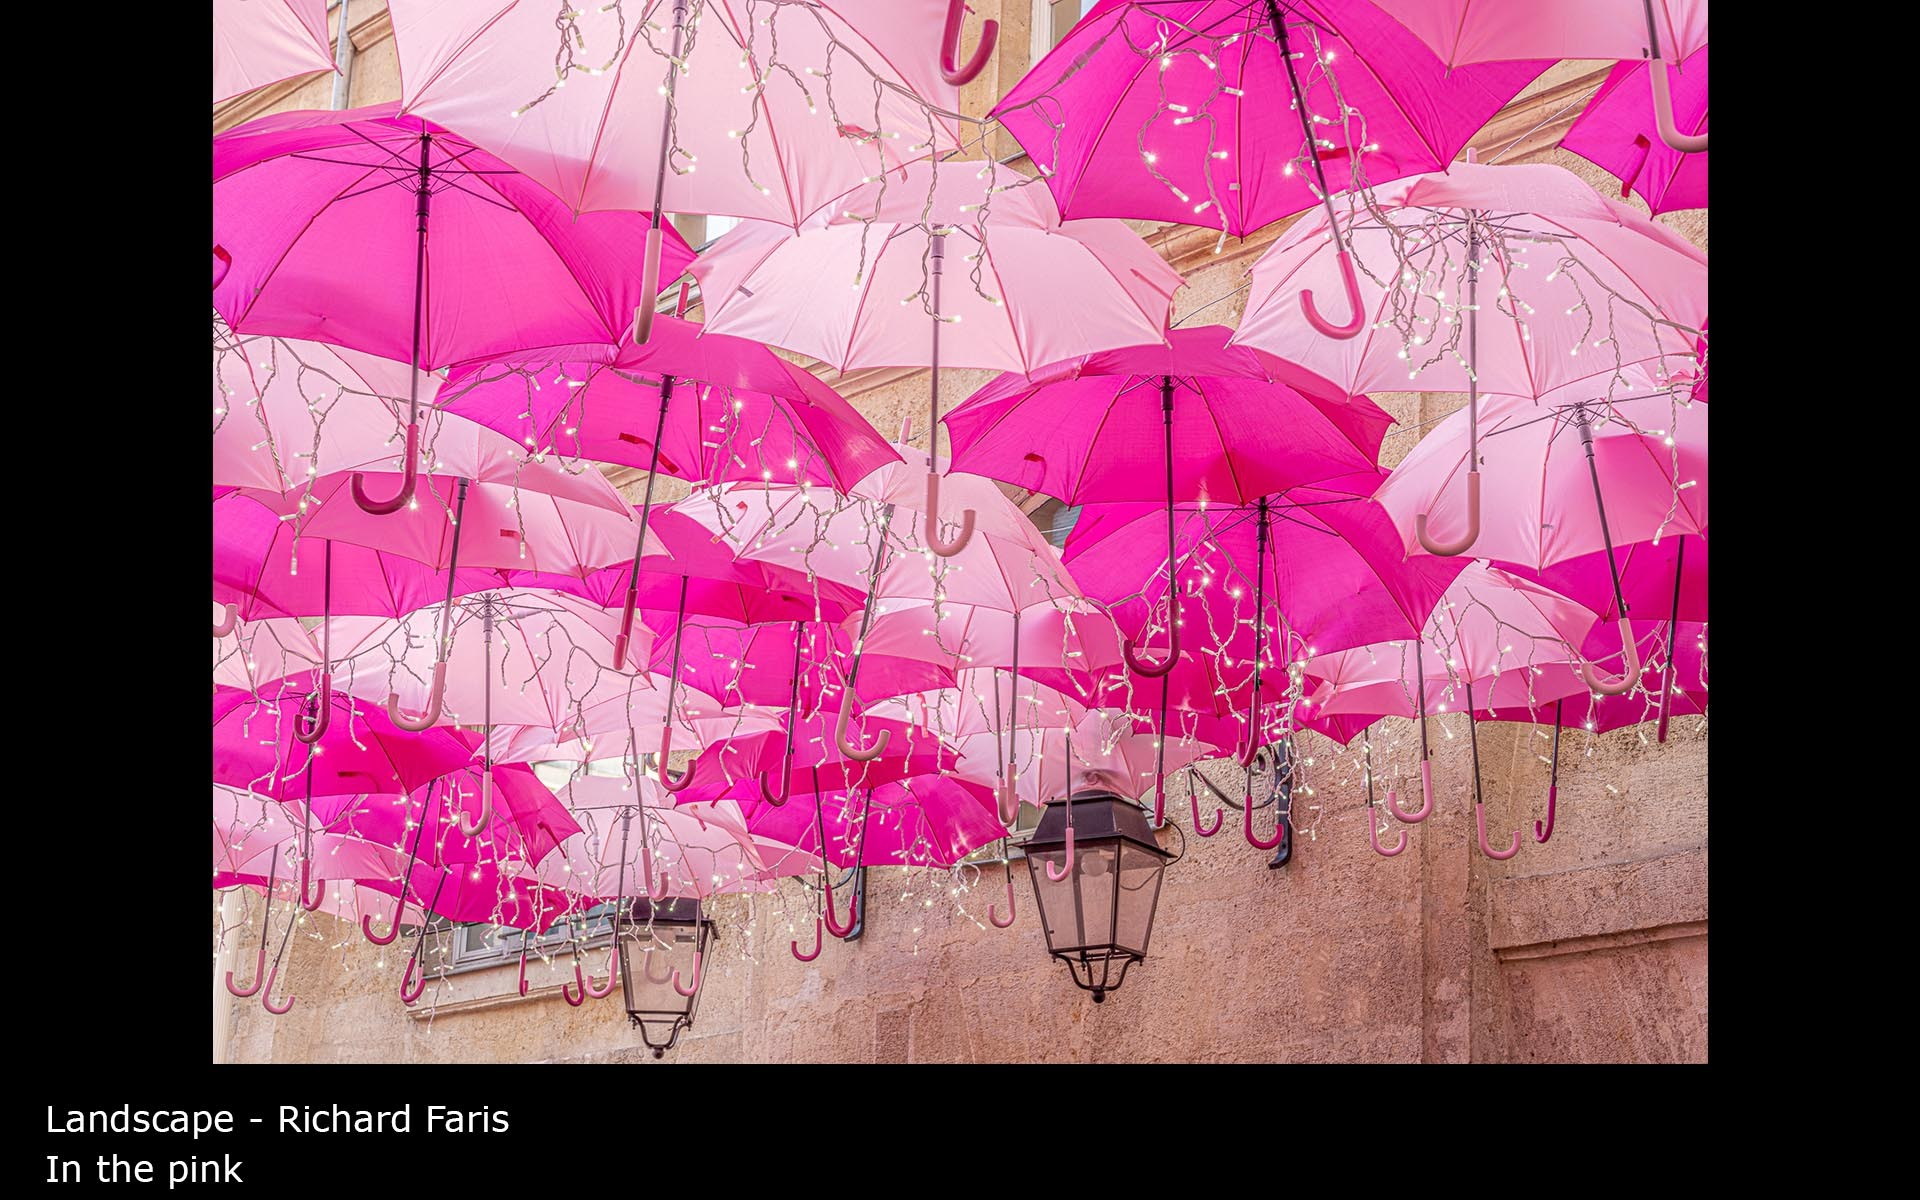 In the pink - Richard Faris